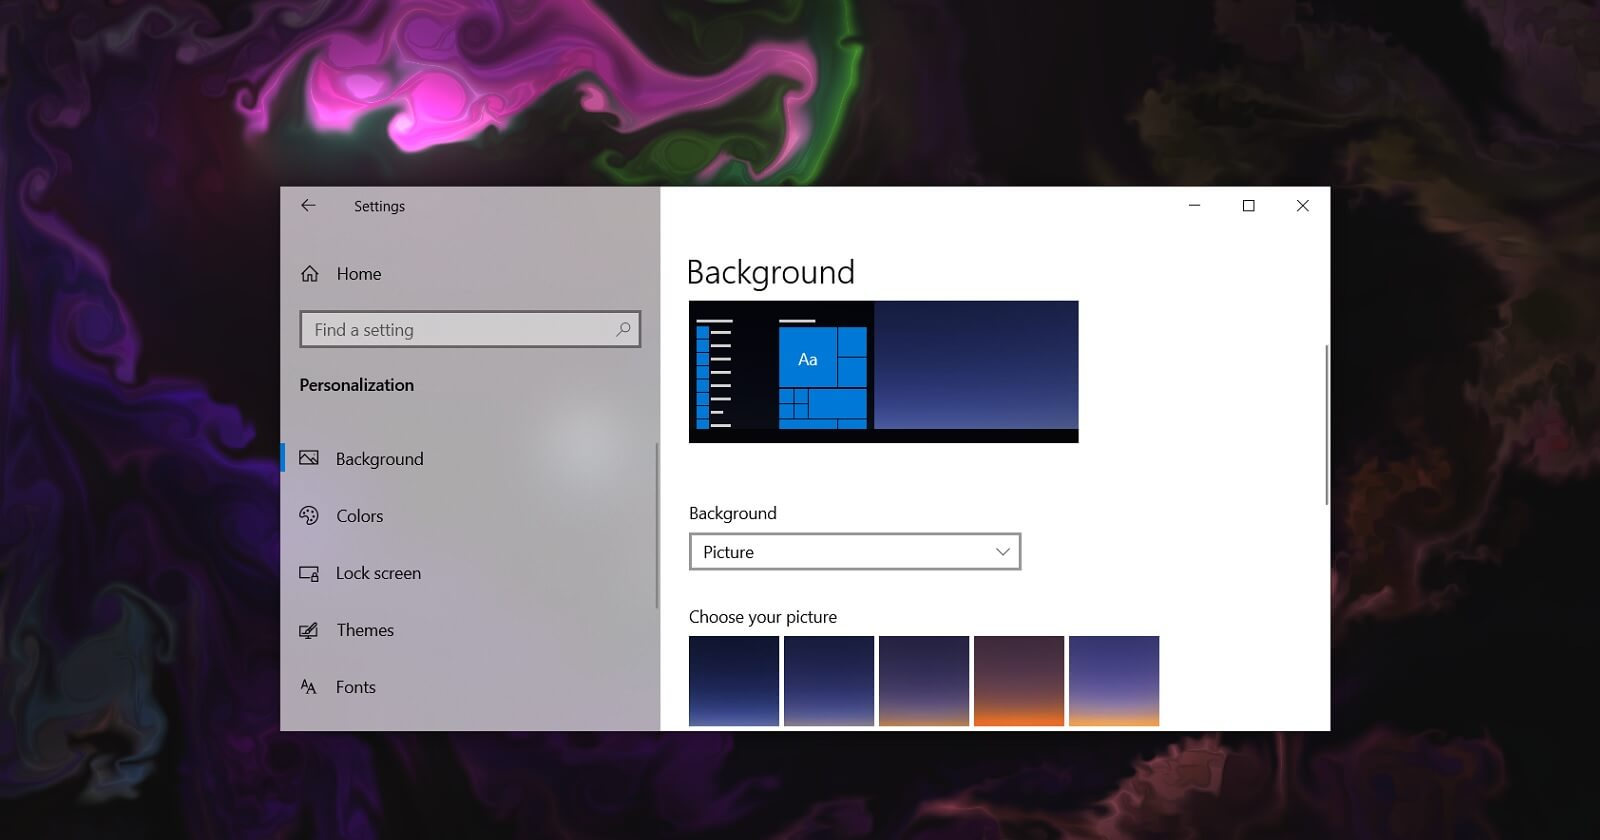 New Microsoft Store App Brings Live Animated Desktop To Windows 10